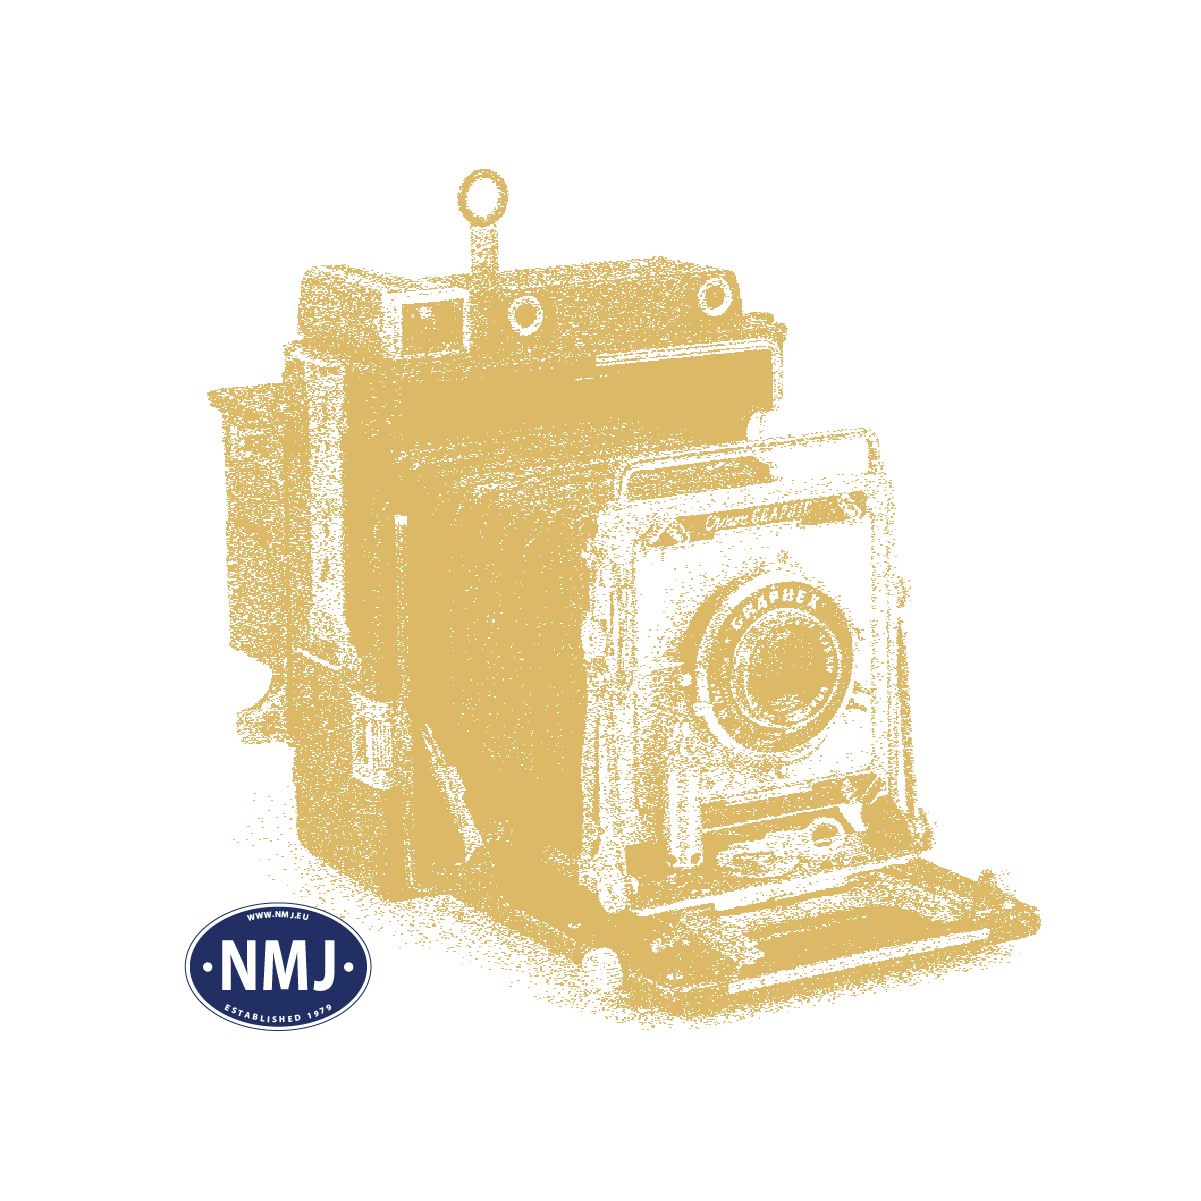 MBR51-4201 - Fir Sommer, 12-16 cm ,TT/H0